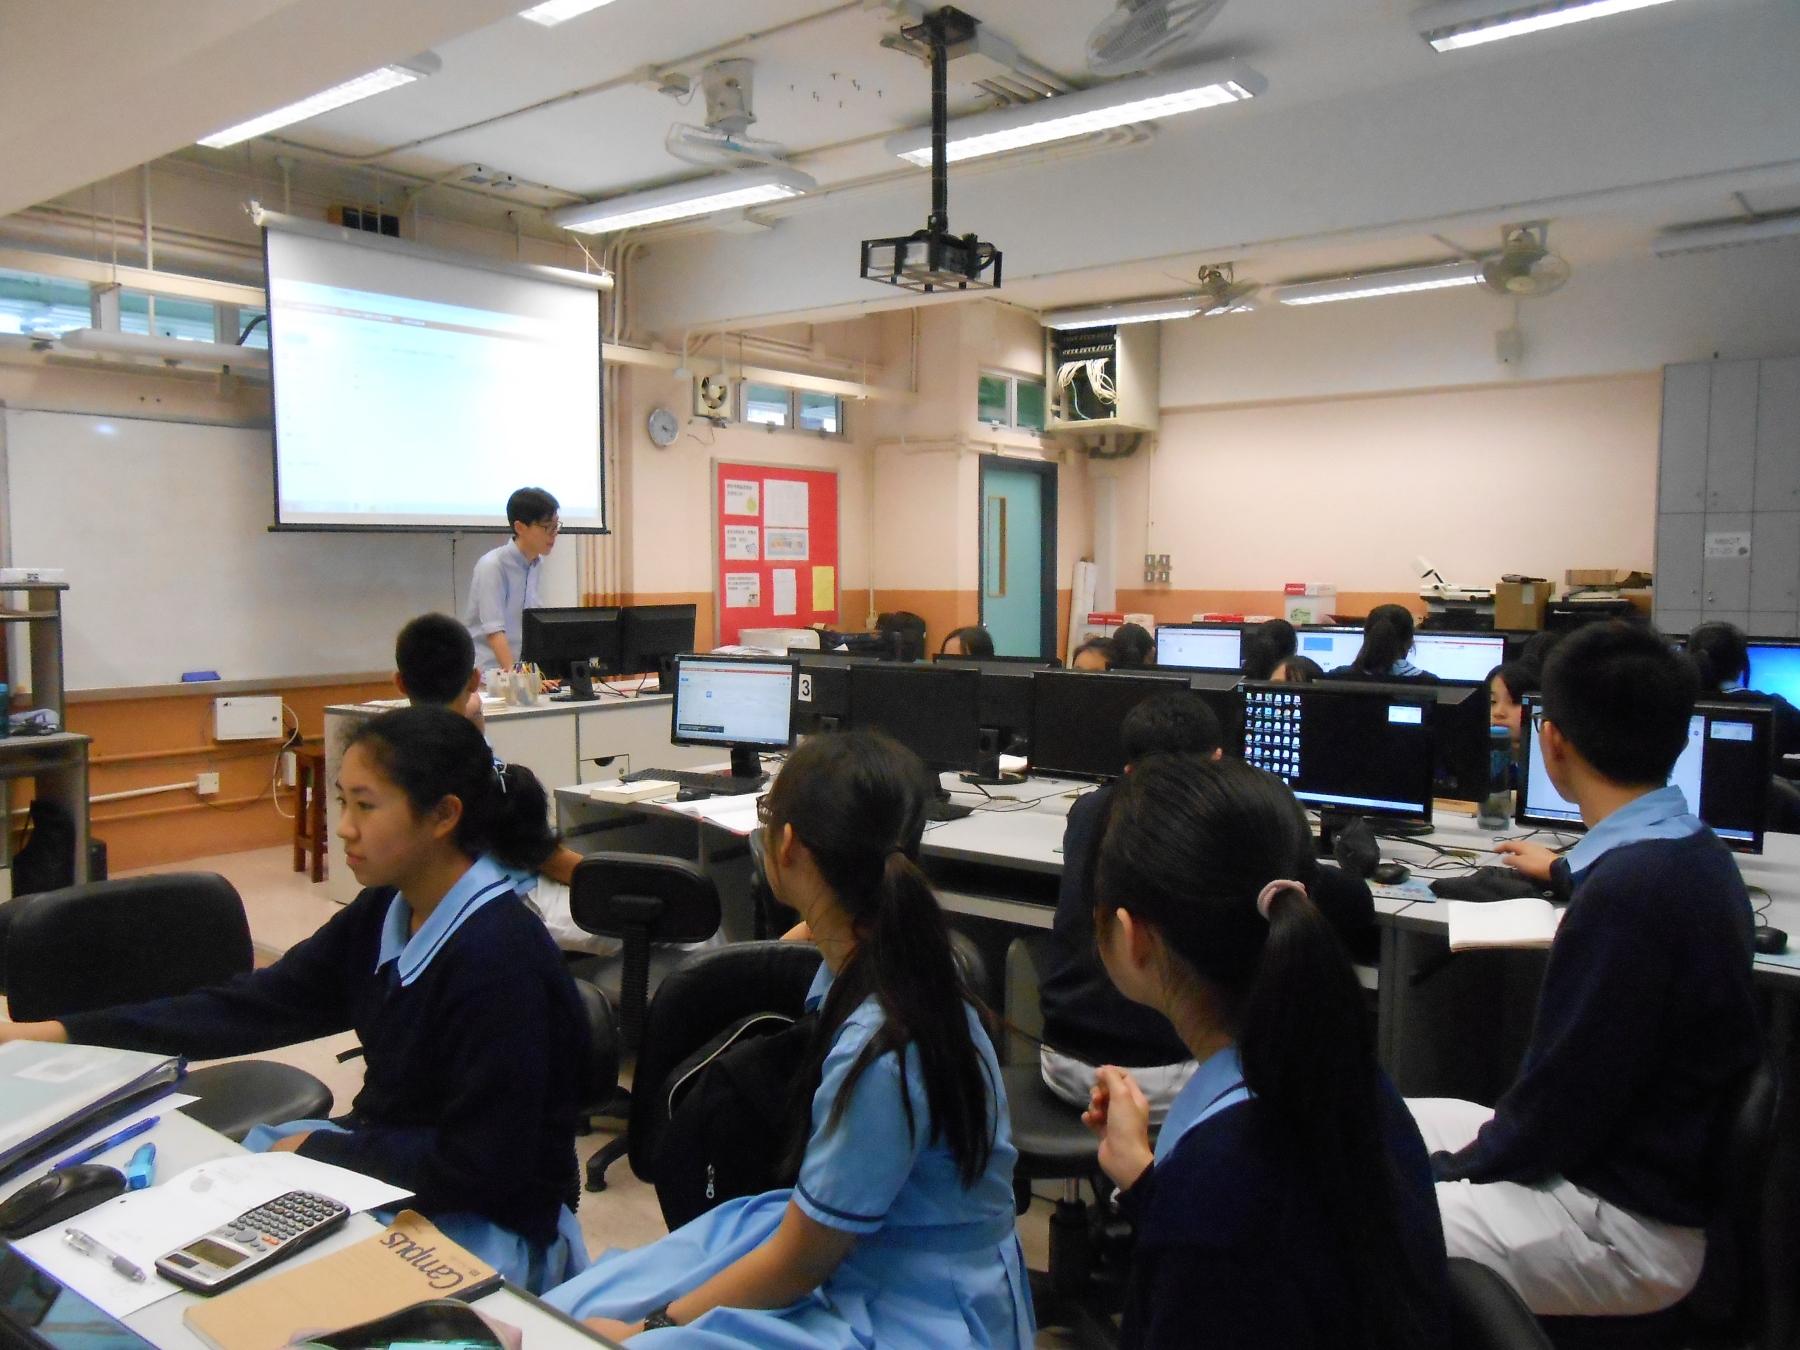 http://npc.edu.hk/sites/default/files/dscn0122.jpg